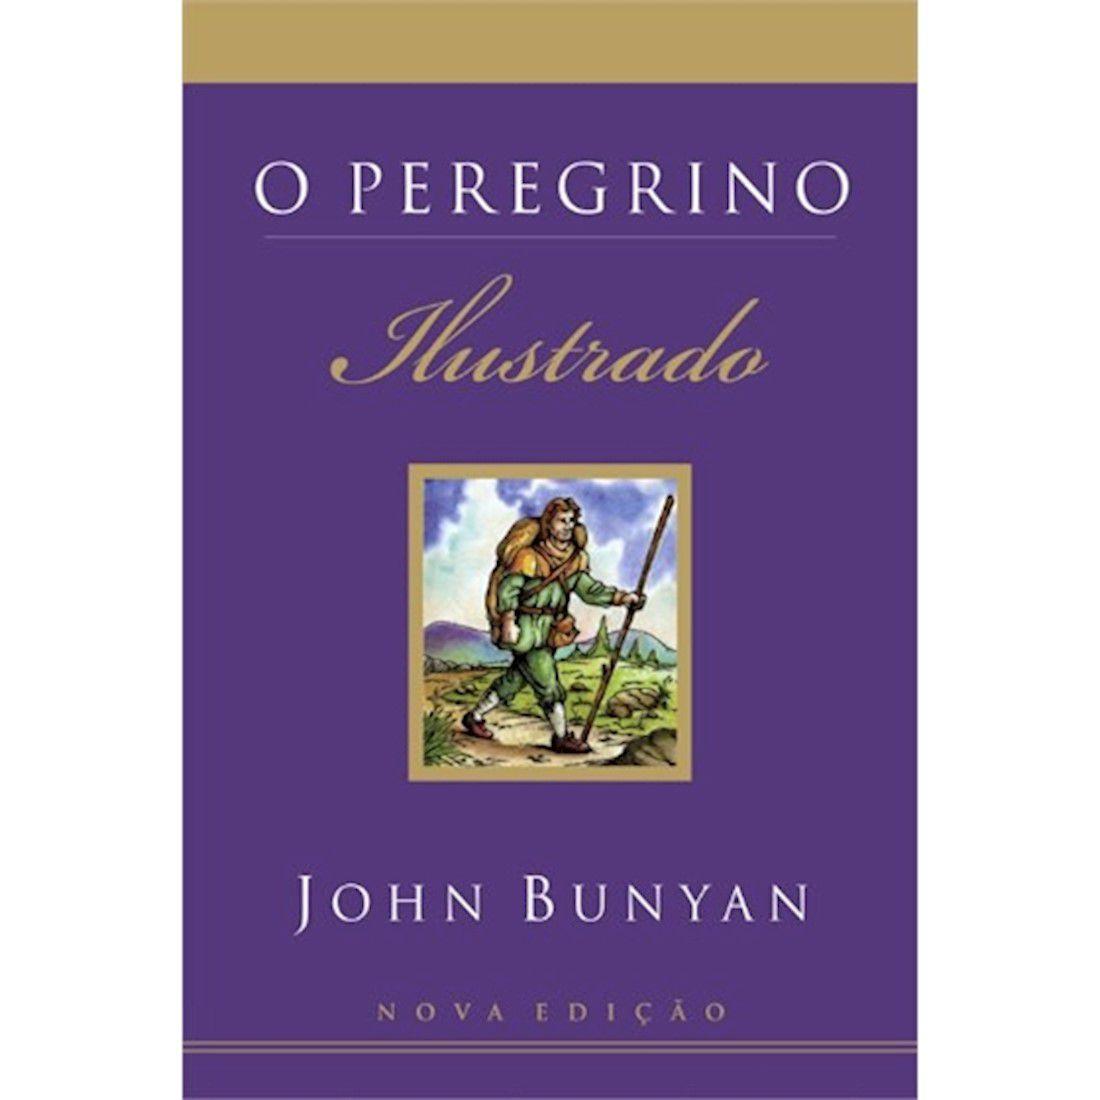 Livro O Peregrino - Ilustrado